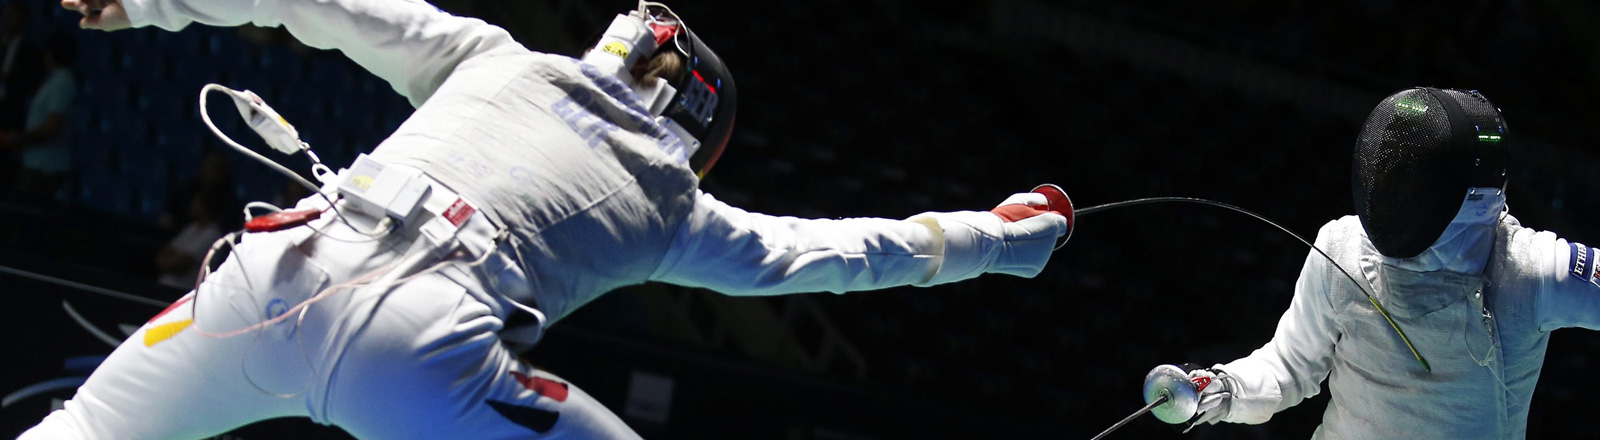 Fechtszene bei der WM 2015: Der deutsche Peter Joppich gegen den Deutschen Sebastian Bachmann beim Florett; Bild: dpa